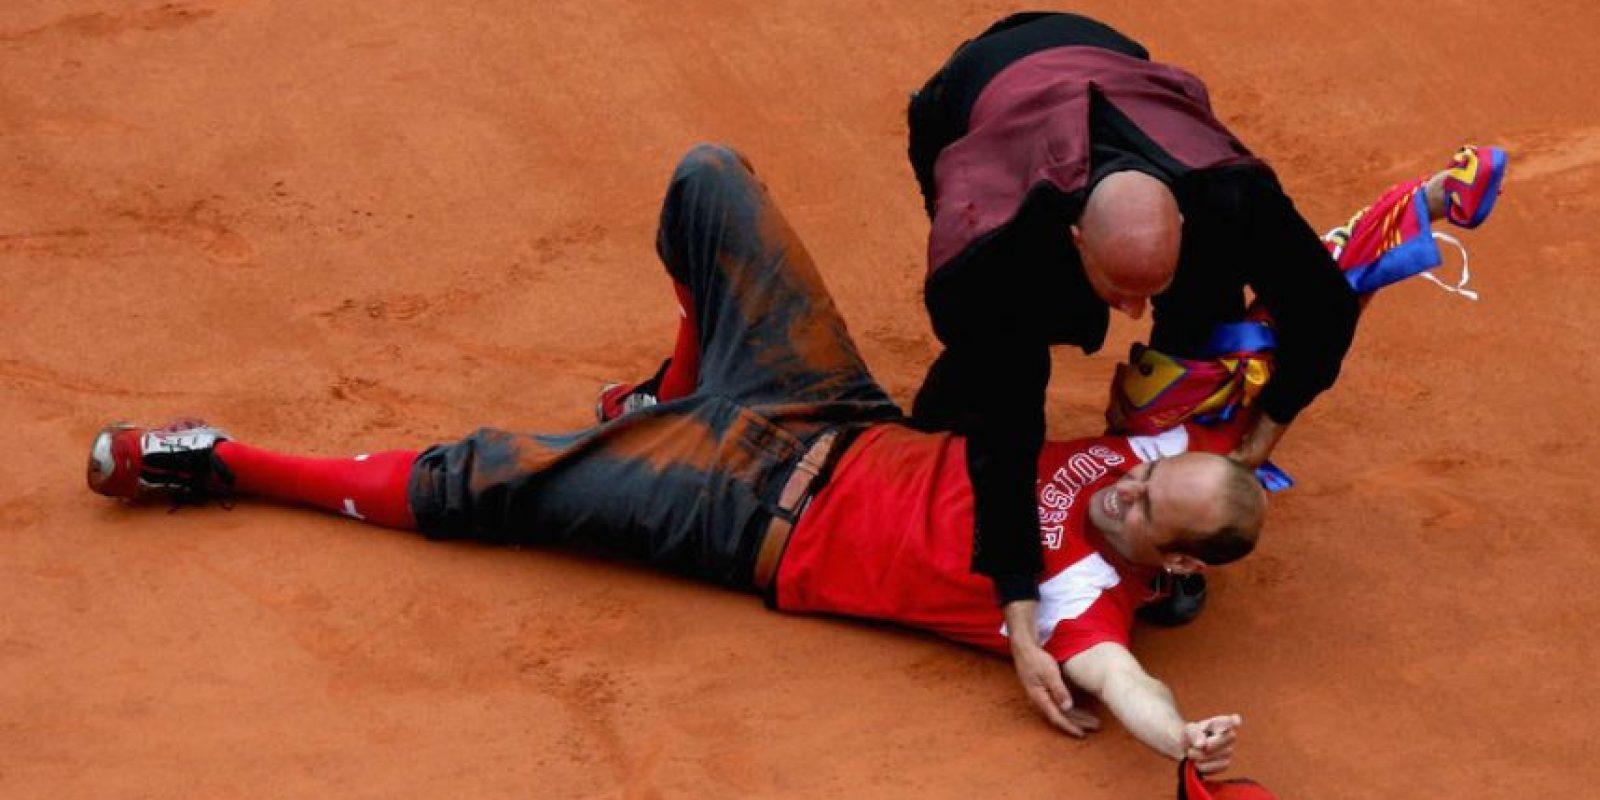 Así terminó Jimmy Jump en la tierra batida de Roland Garros. Foto:Getty Images